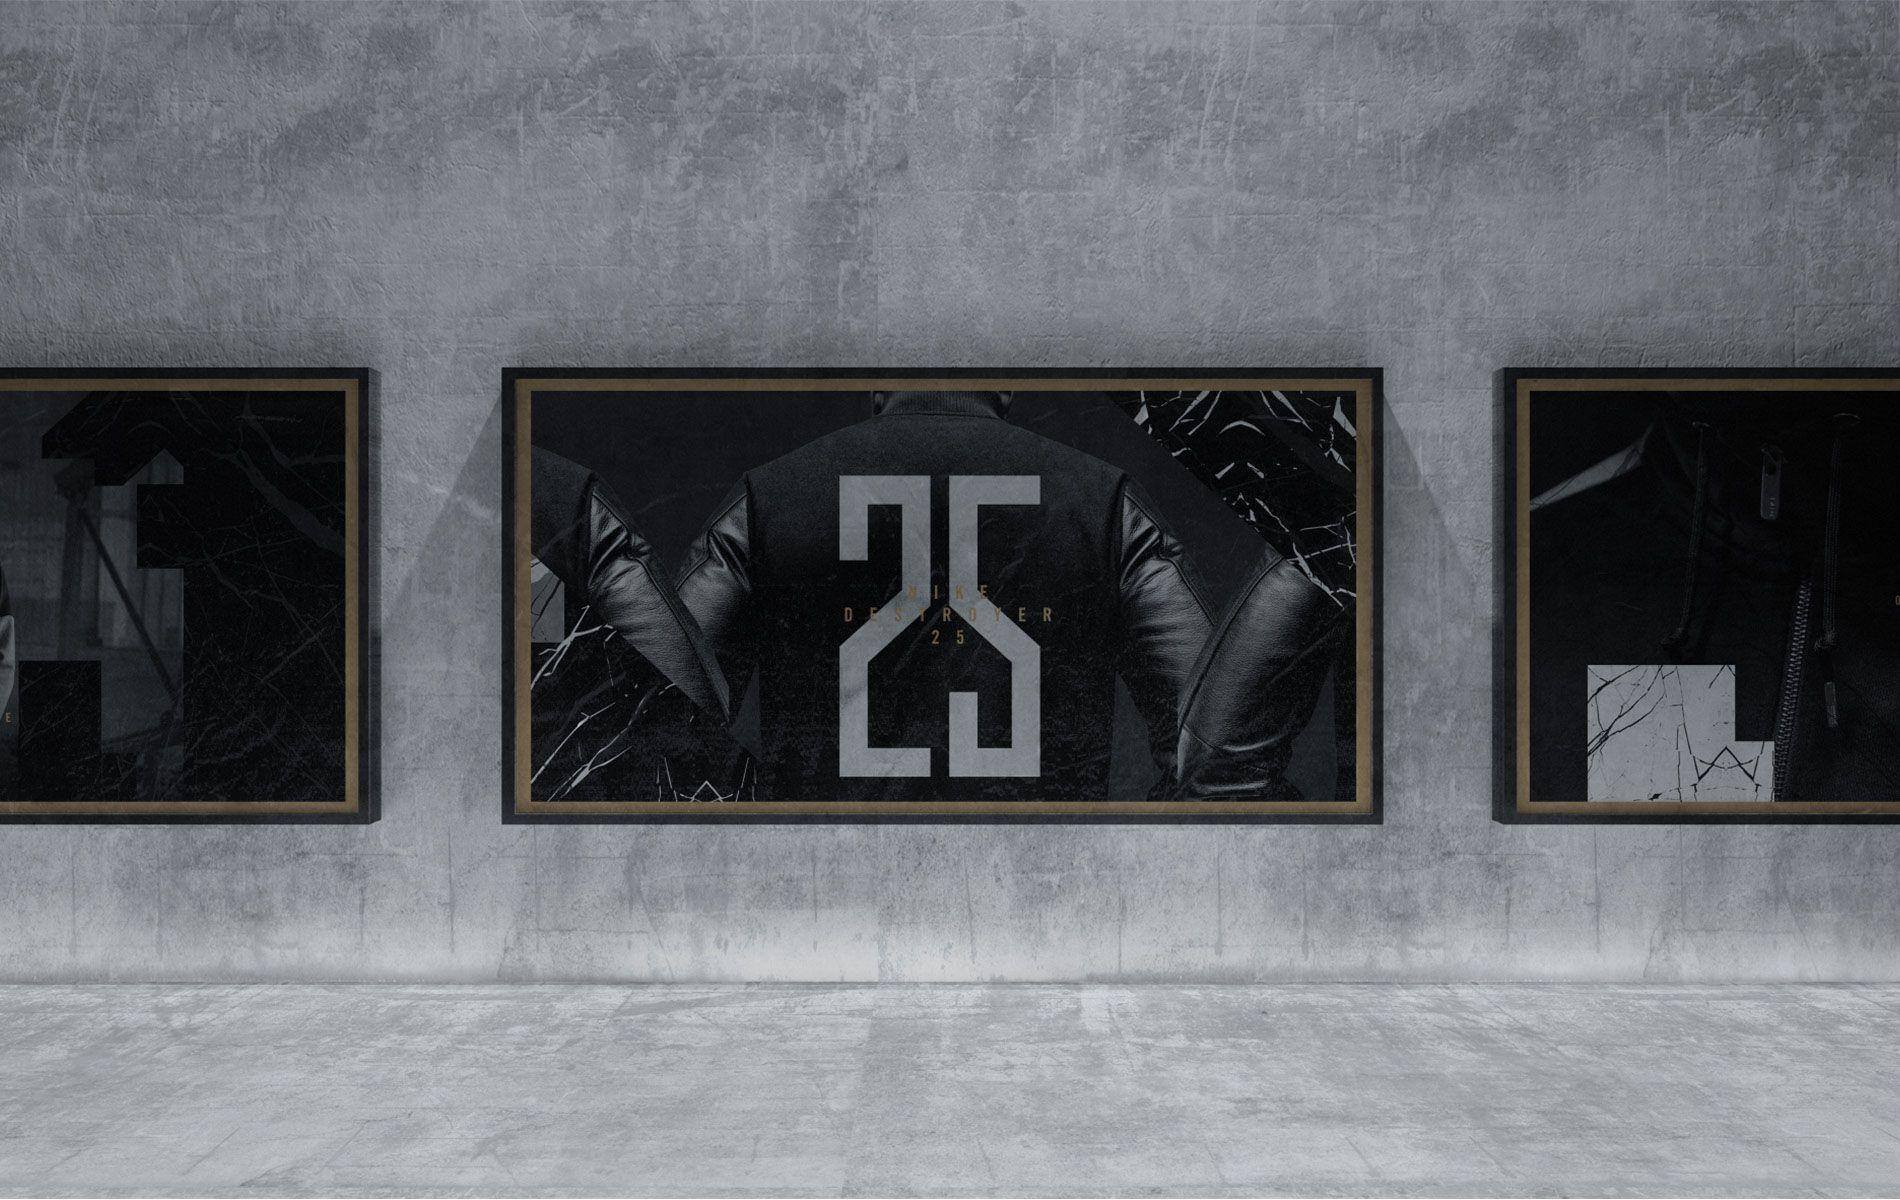 Autonomía pétalo Tropical  Nike Nx.25 on Behance   Nike, Brand concept, Brand identity